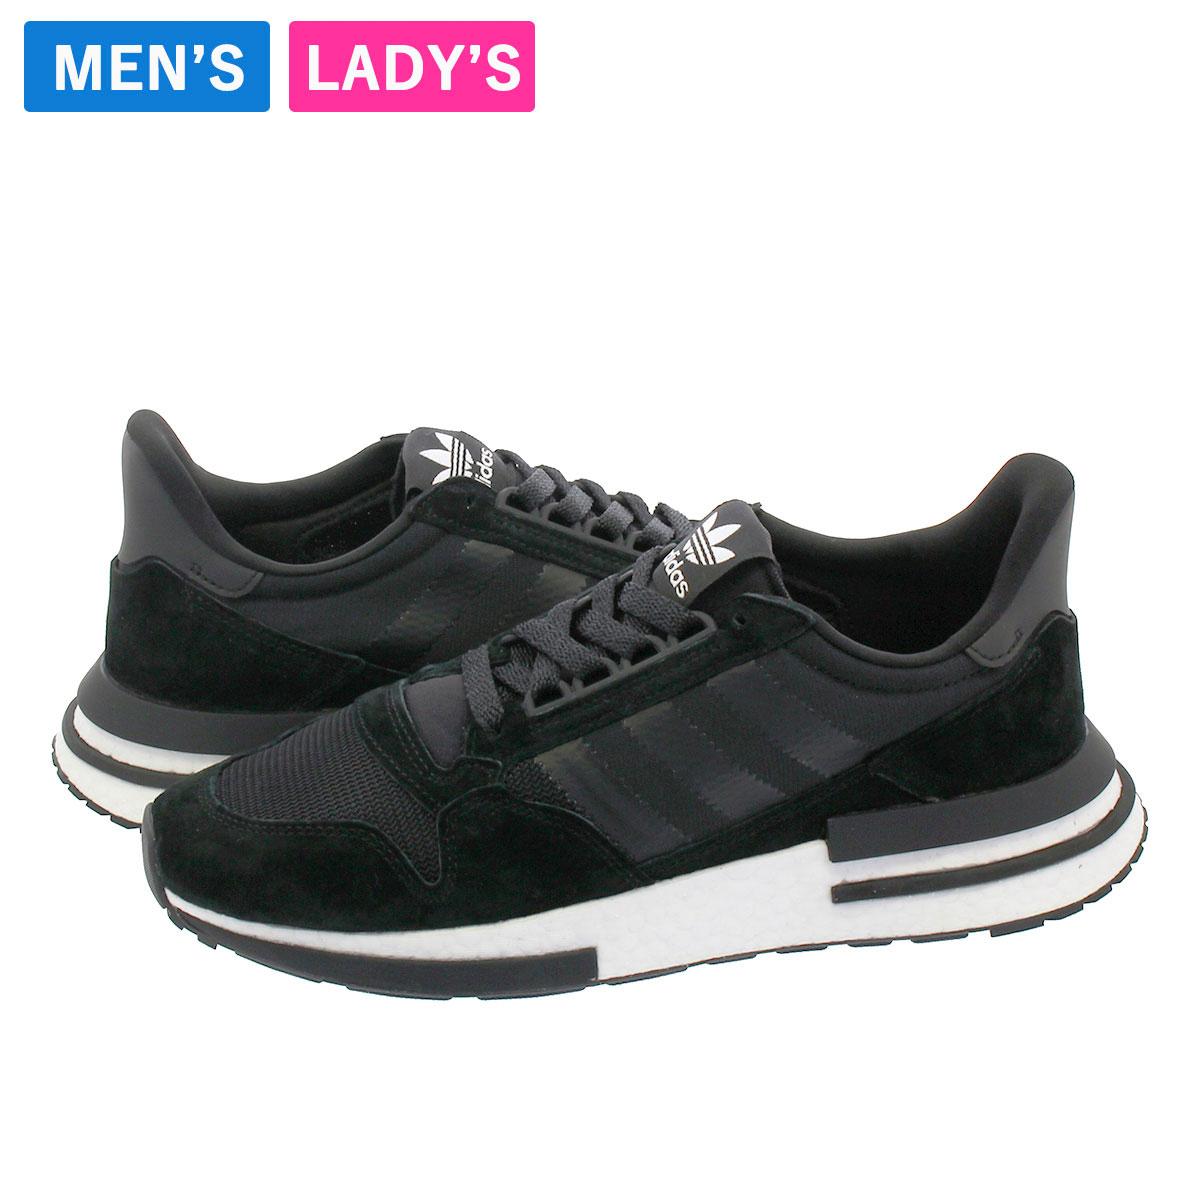 timeless design 7abf8 84126 adidas ZX 500 RM Adidas ZX 500 RM CORE BLACK/RUNNING WHITE b42227